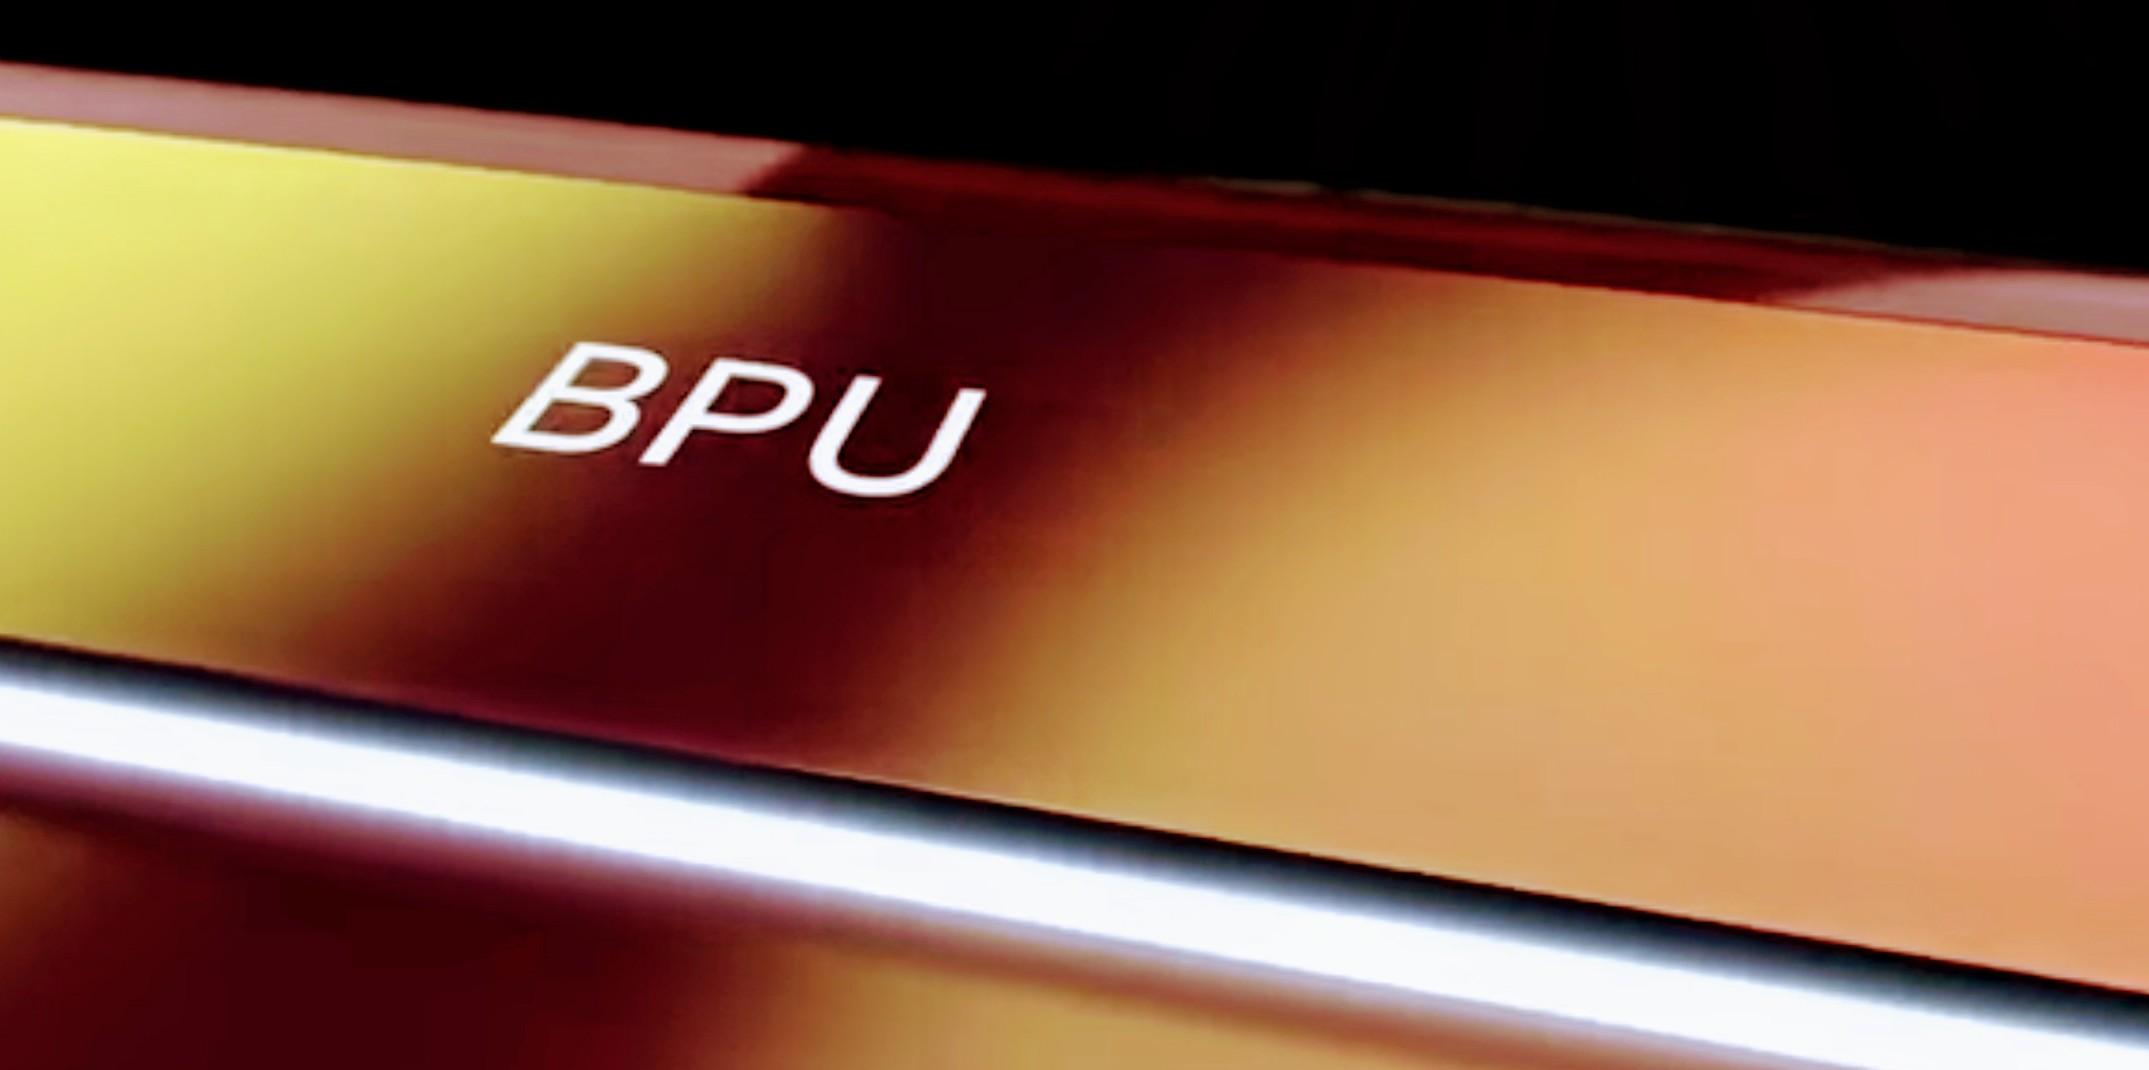 Chip laptop thế hệ mới